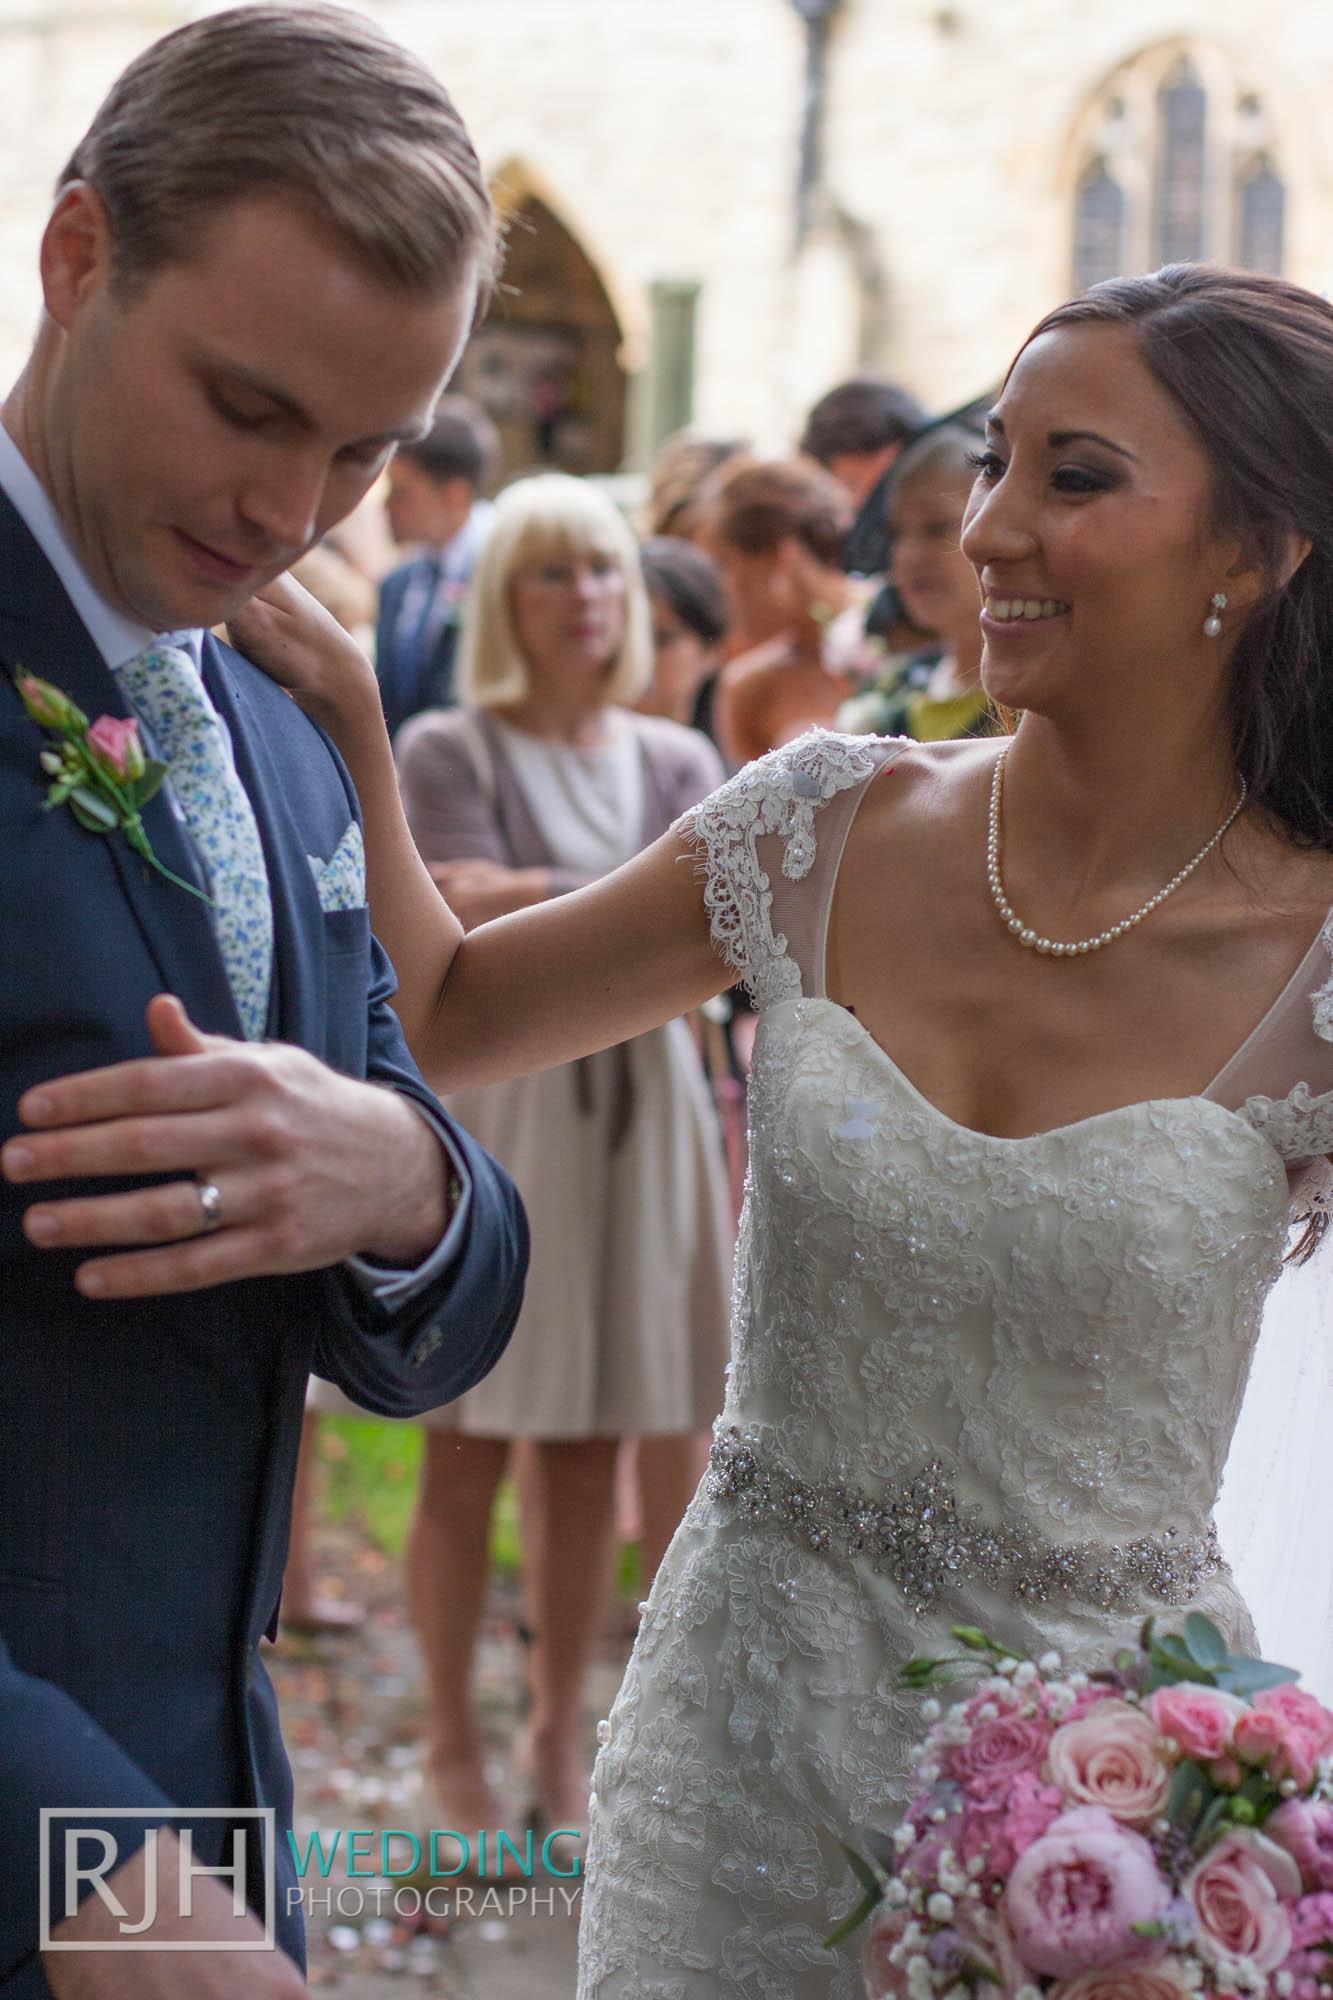 RJH Wedding Photography_Tankersley Manor Wedding_29.jpg